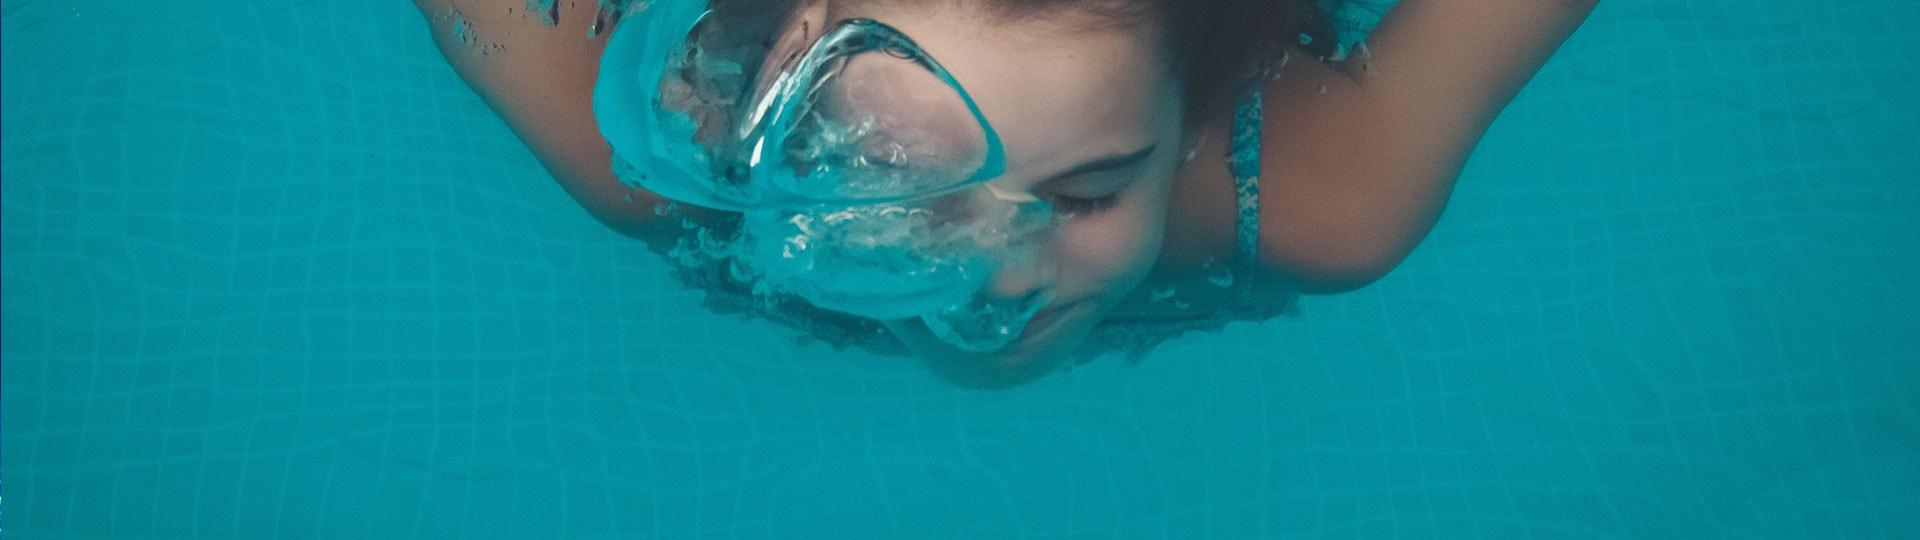 consejos-evitar-irritacion-ojos-cloro-piscina-detalle